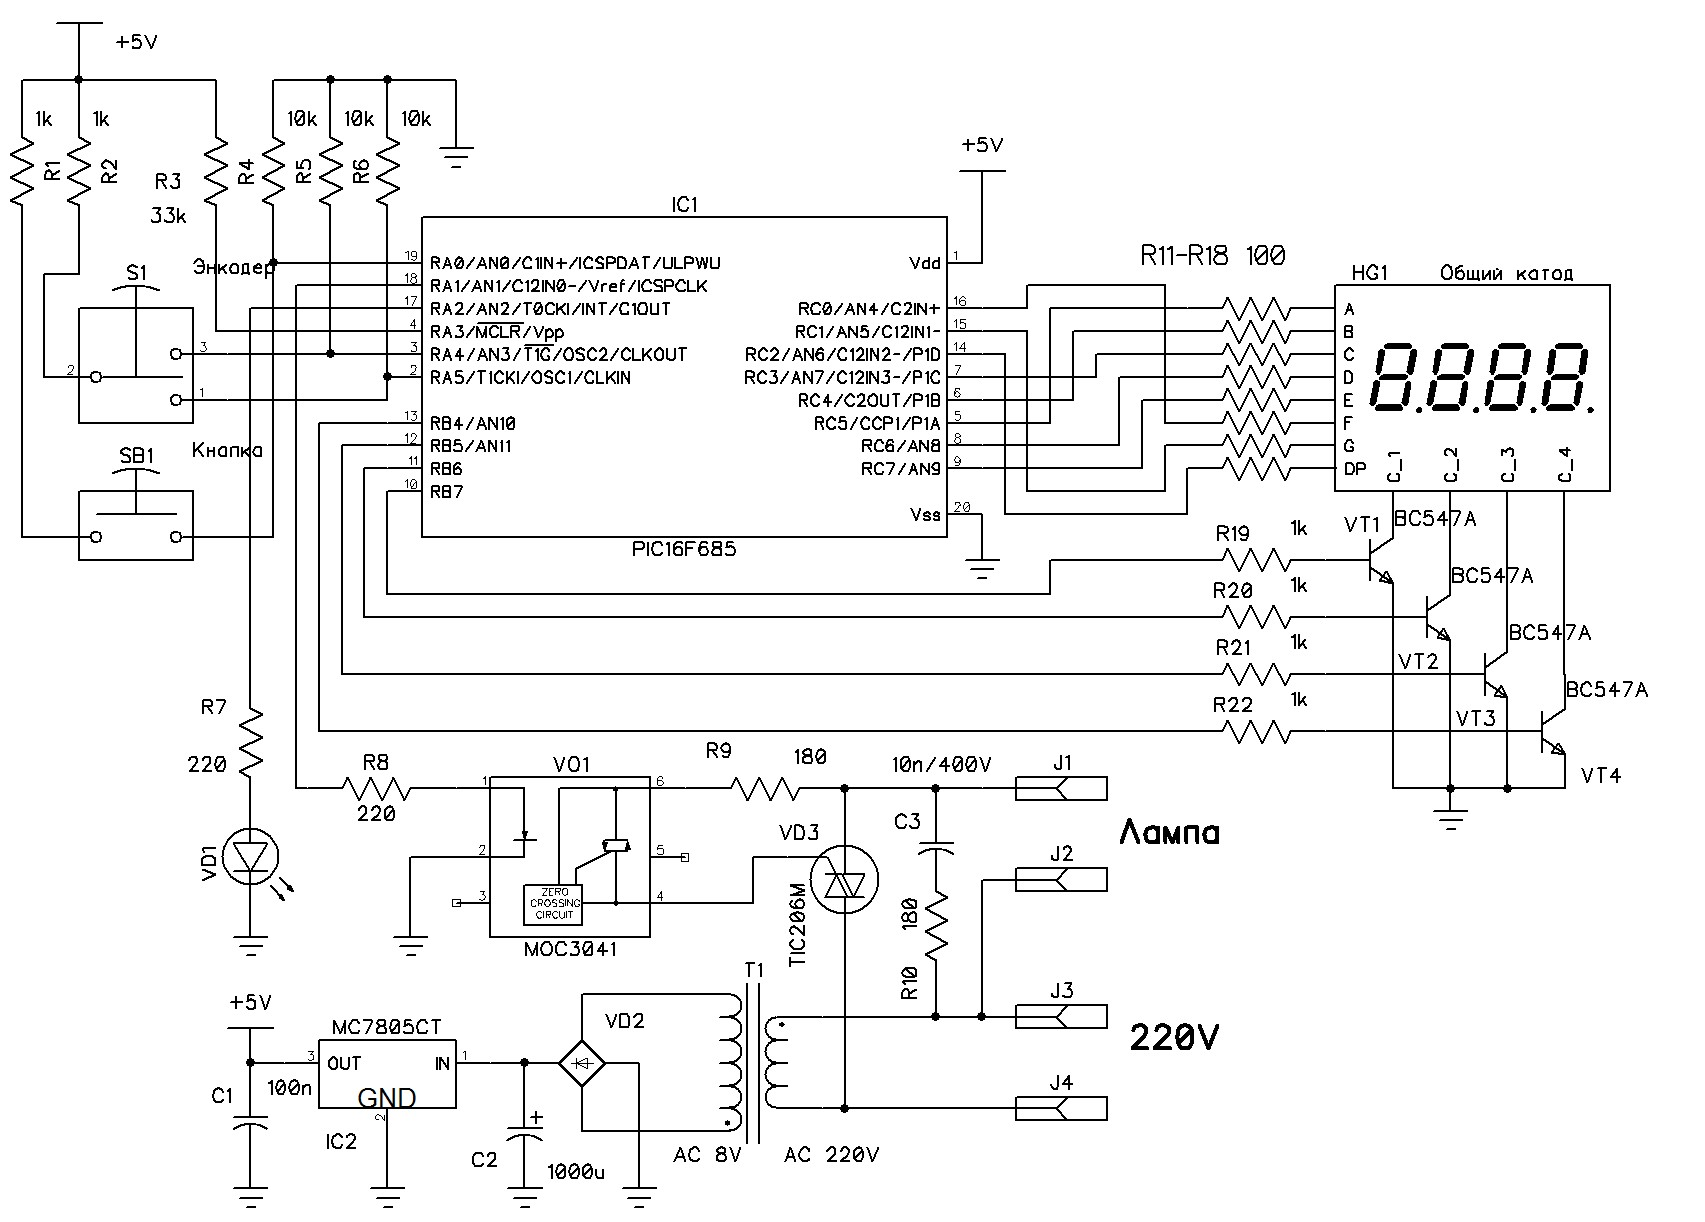 схема подключения moc3041